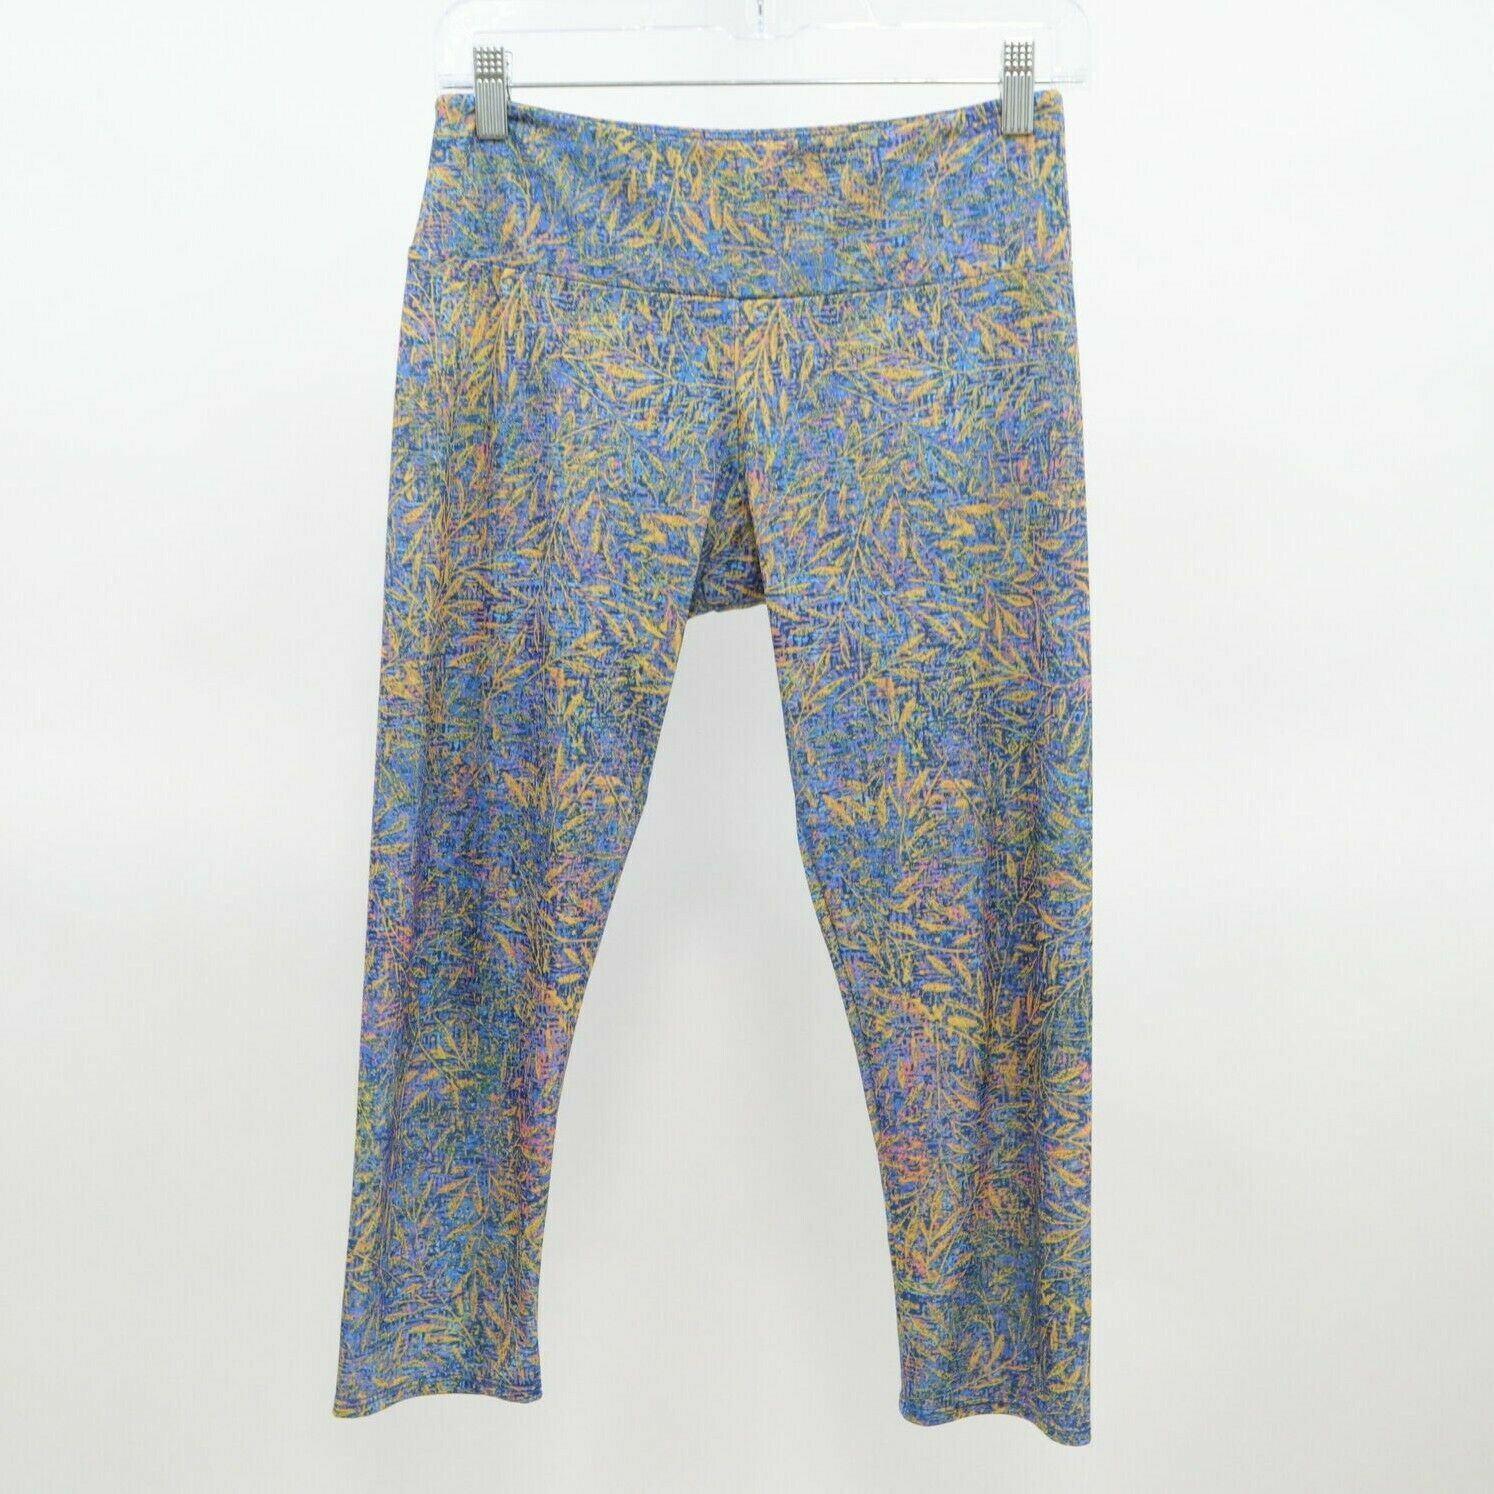 Onzie Leggings Yoga Pants Womens M/L Graphic Print Blue Yellow Pink Leaf